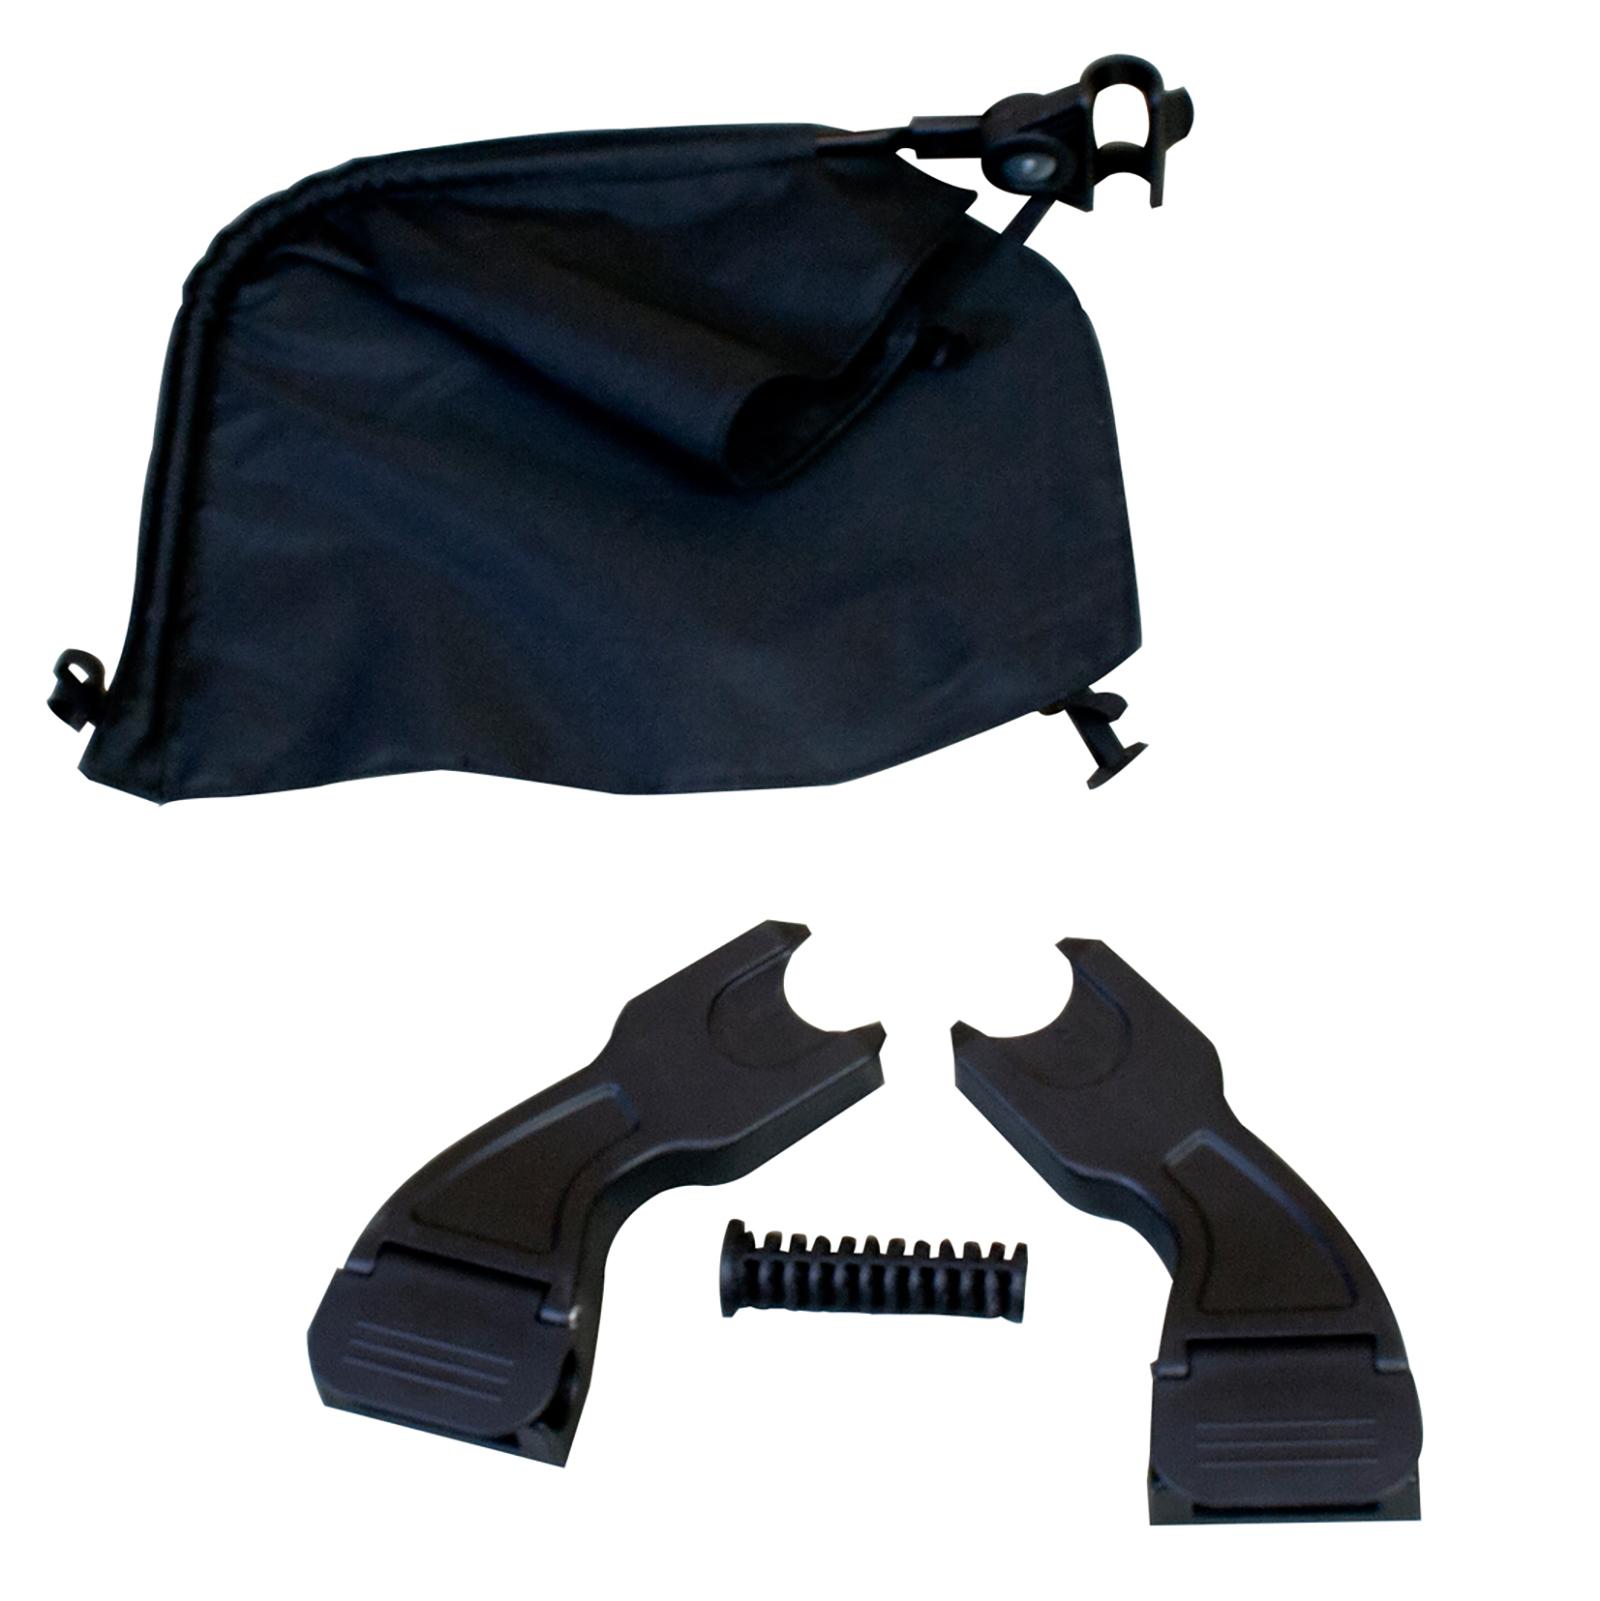 Mountain Buggy Duet Car Seat Adaptors (Clip 28 - For 1 Car Seat)